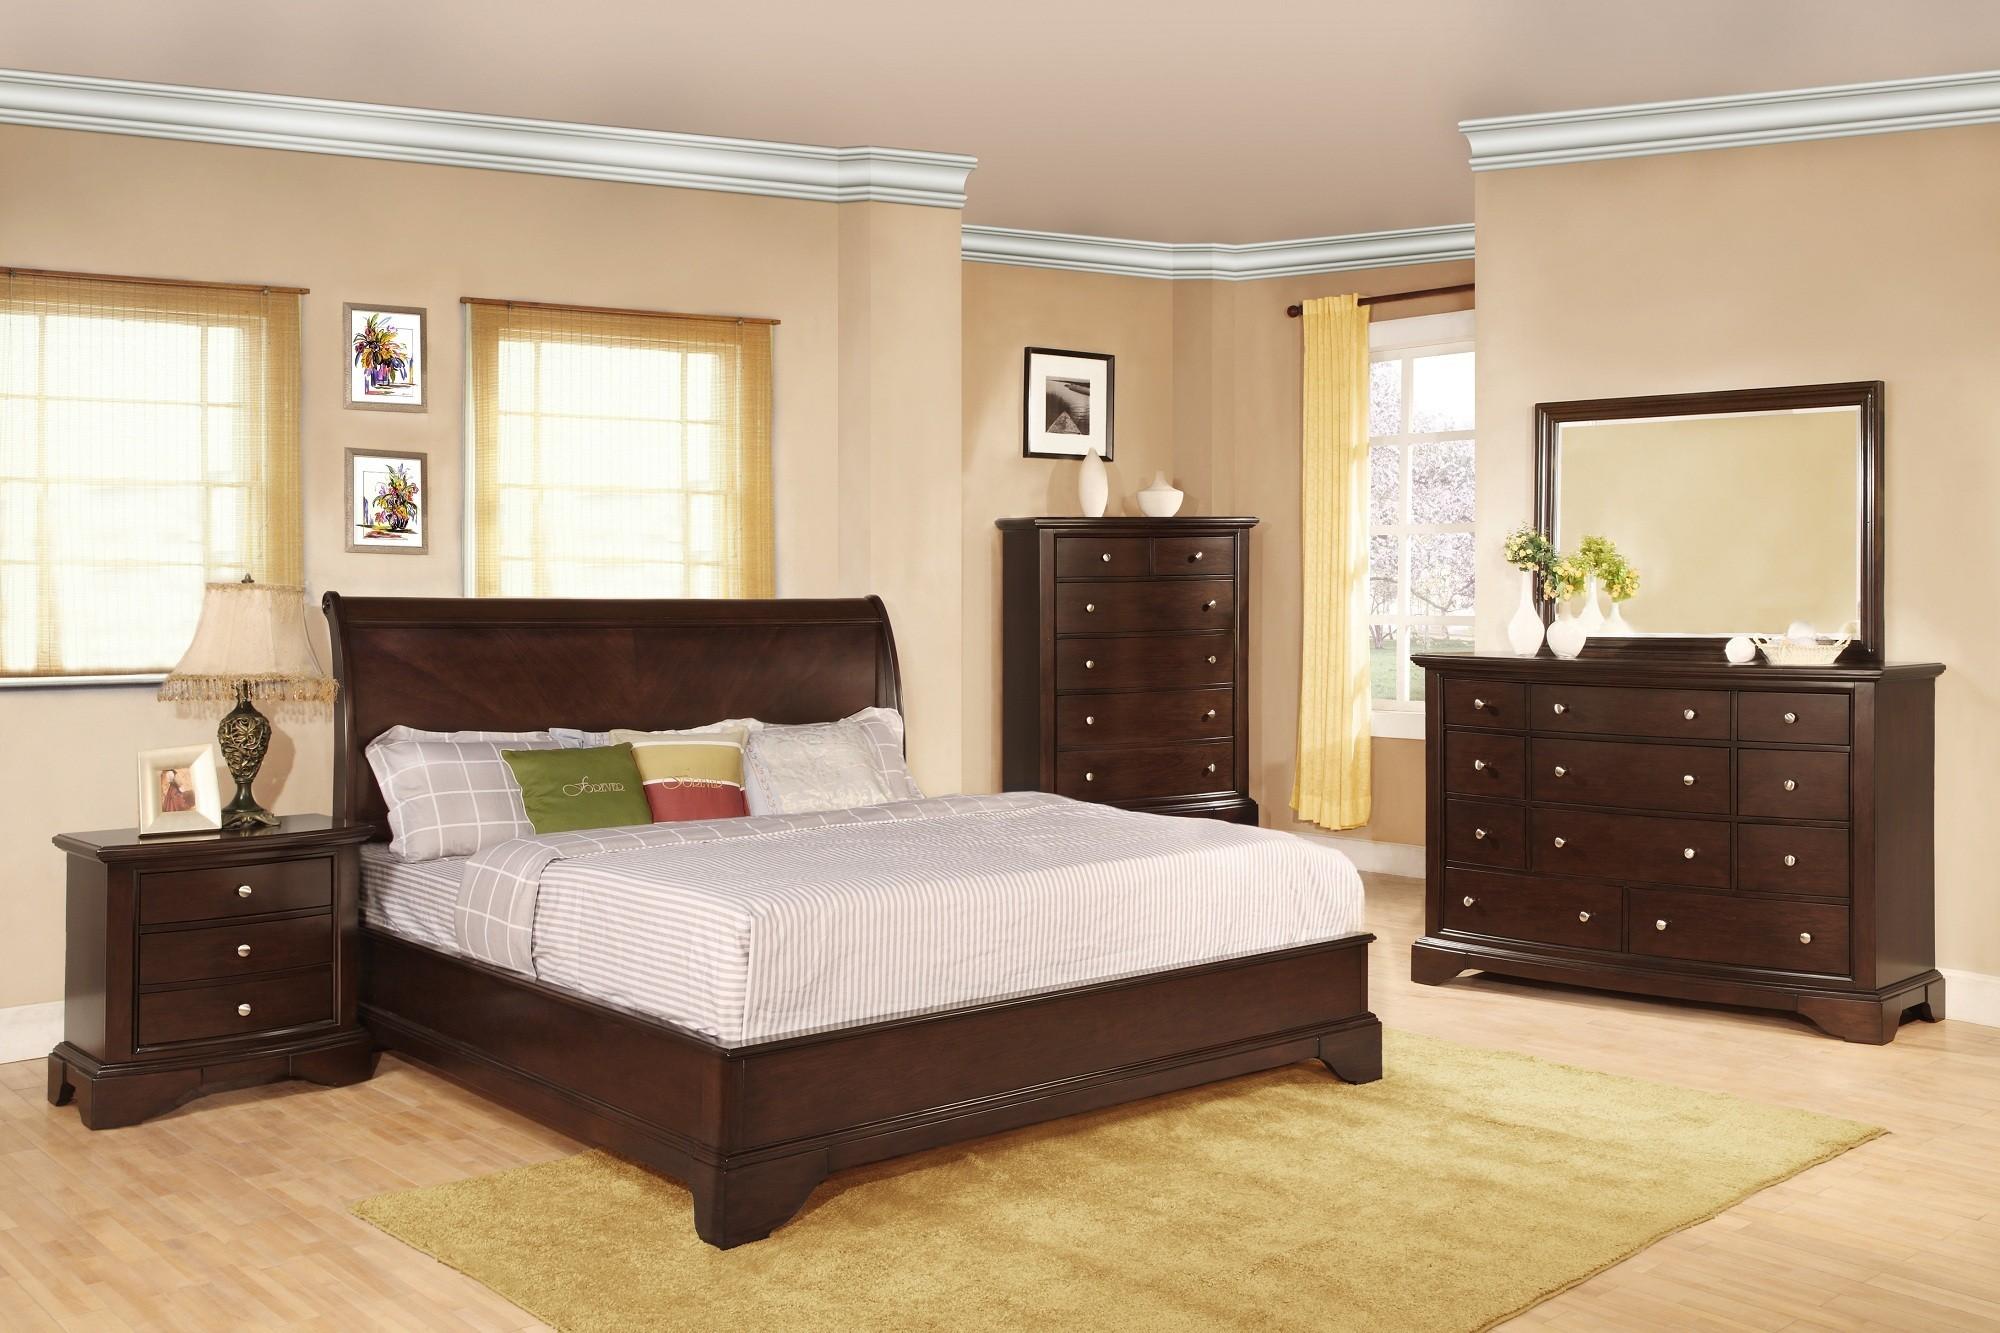 بالصور غرف نوم حديثه , احدث اشكال غرف النوم 3687 11